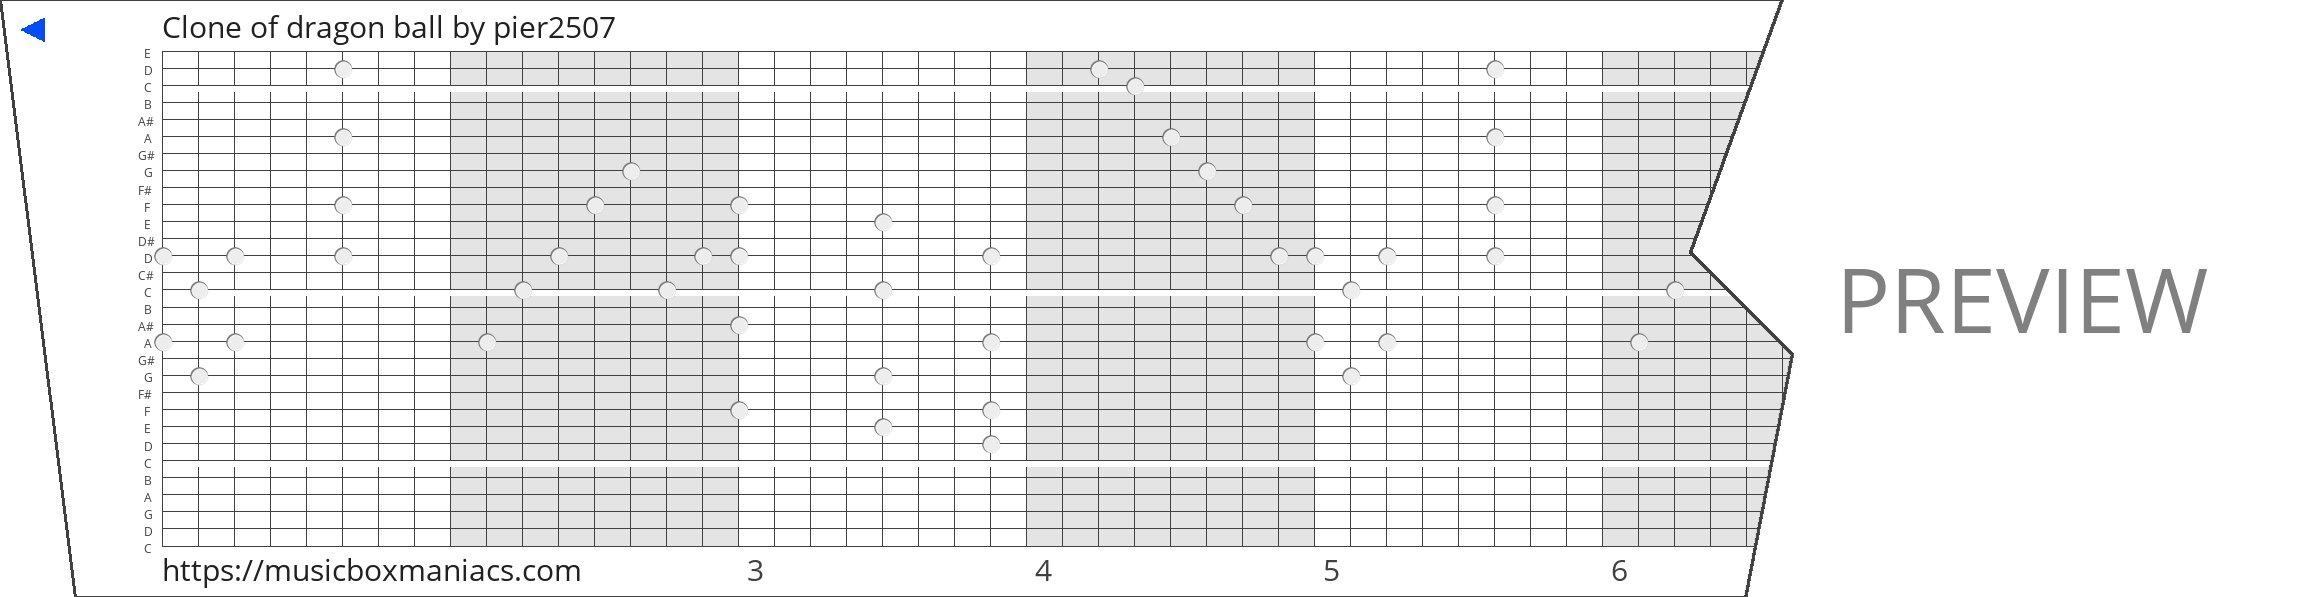 Clone of dragon ball 30 note music box paper strip